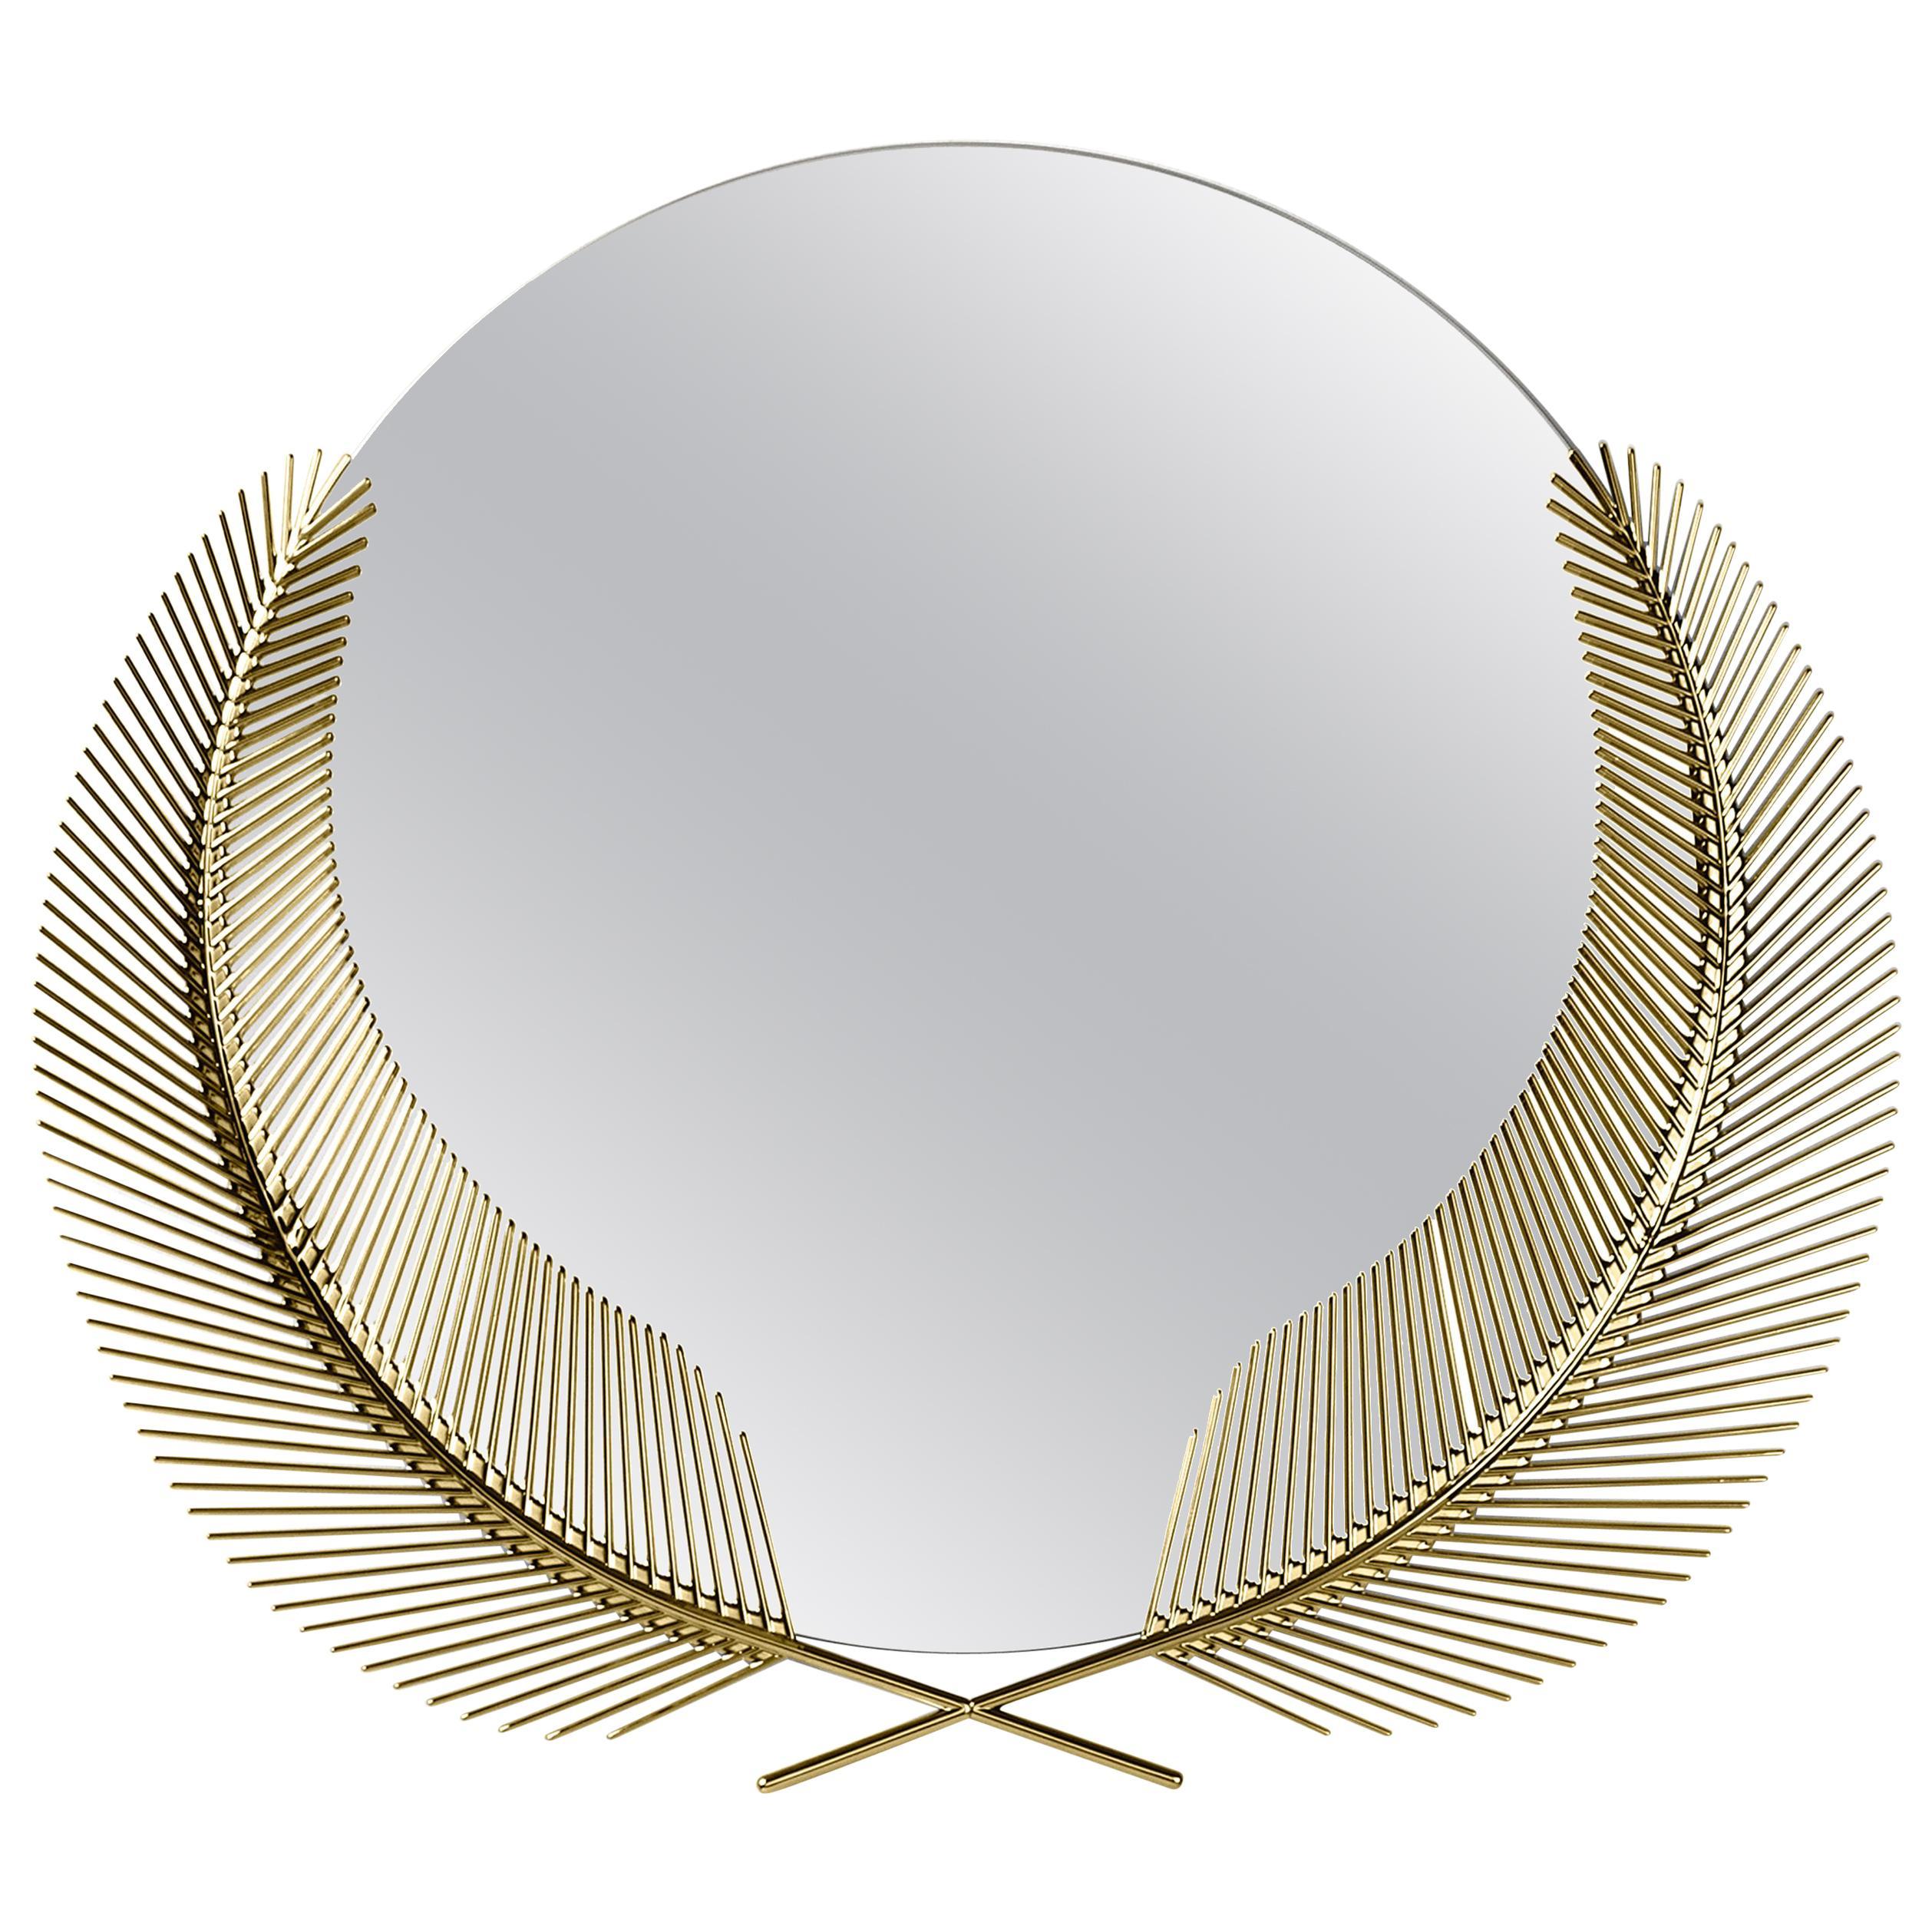 Ghidini 1961 Sunset Medium Mirror in Brass by Nika Zupanc